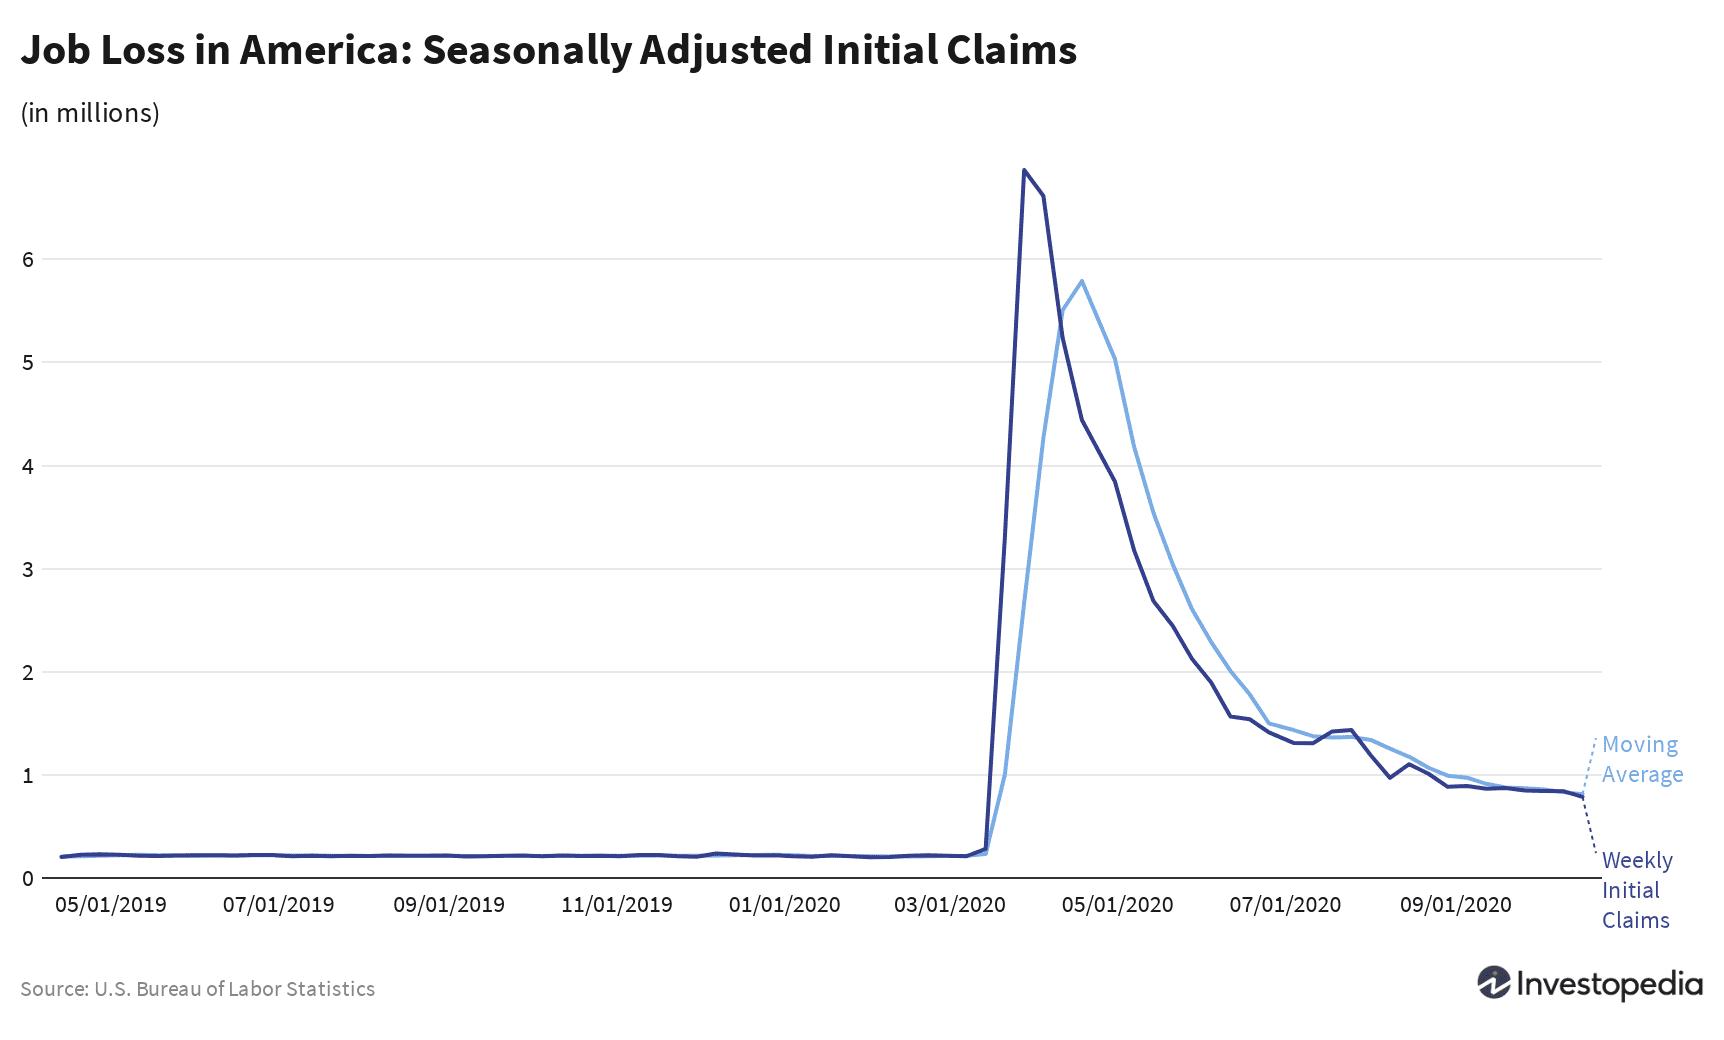 Job loss in America: Seasonally adjusted initial claims